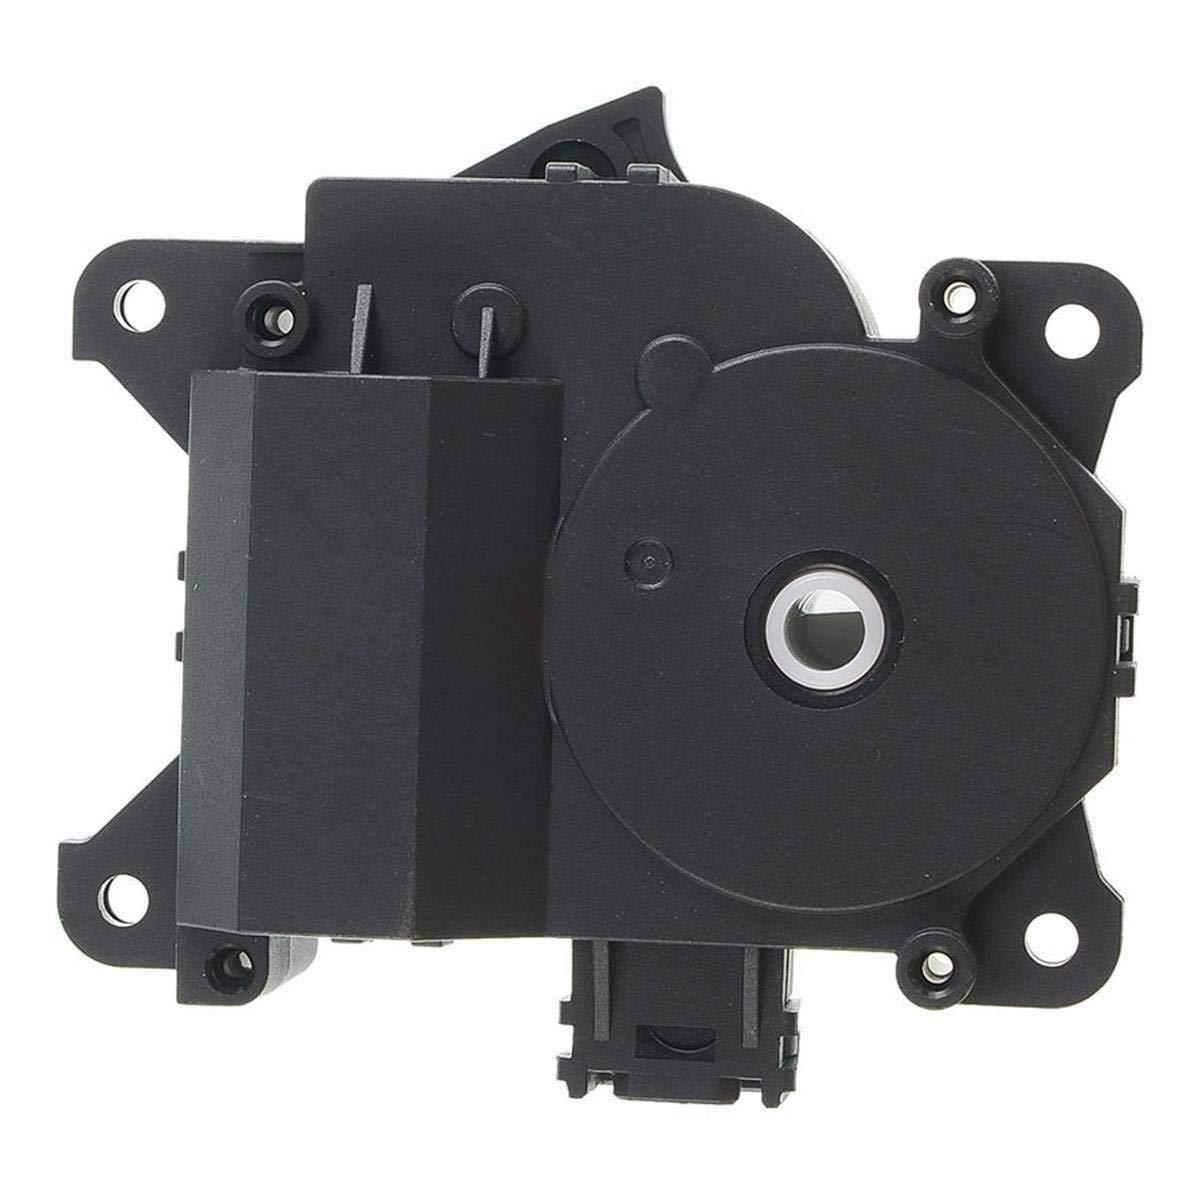 HVAC Heater Blend Door Actuator Replaces OEM 87106-07140 604-962